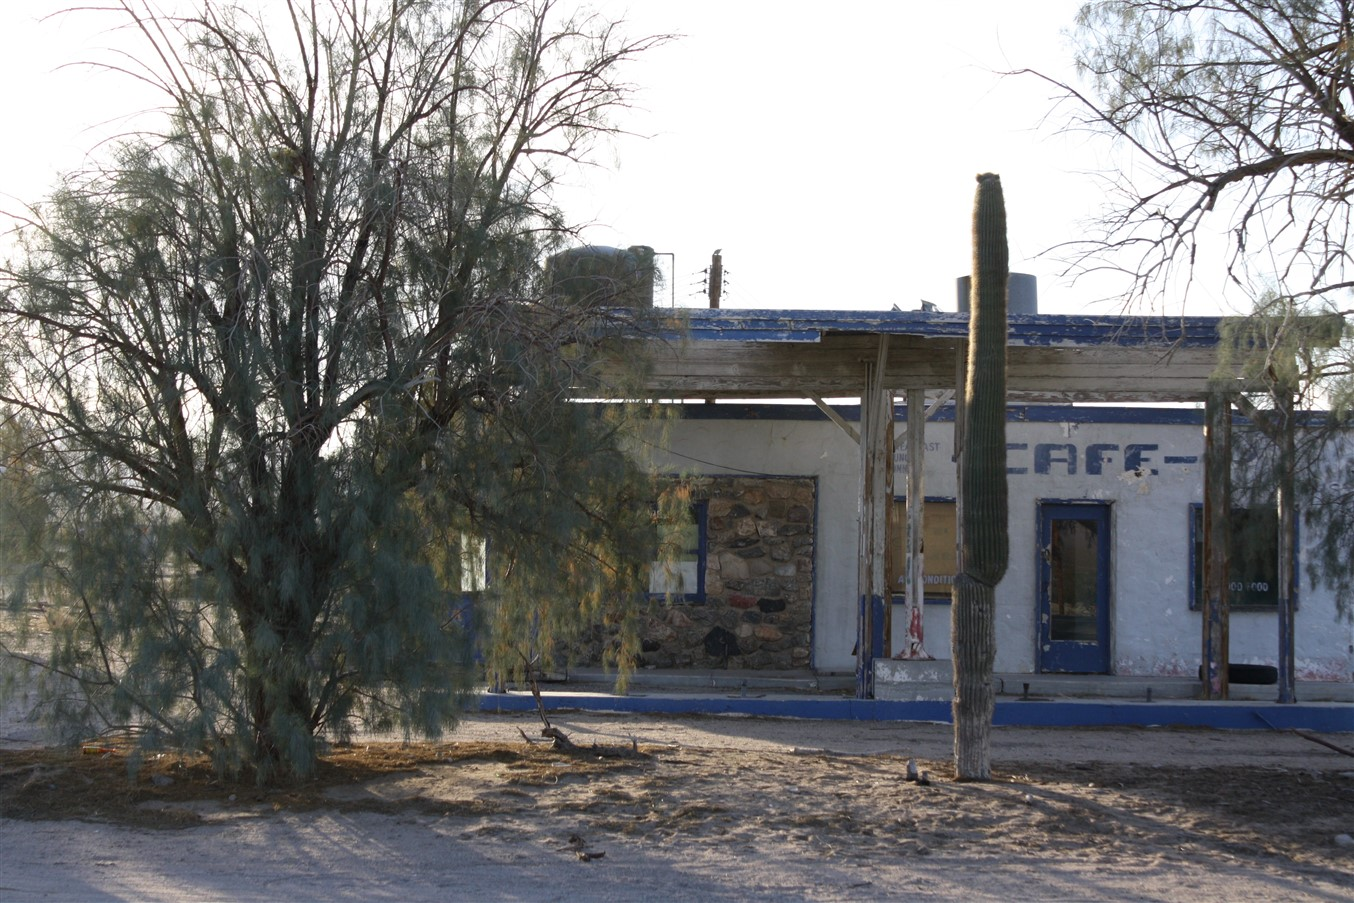 2012 03 14 Route 66 Road Trip 42 California Desert.jpg